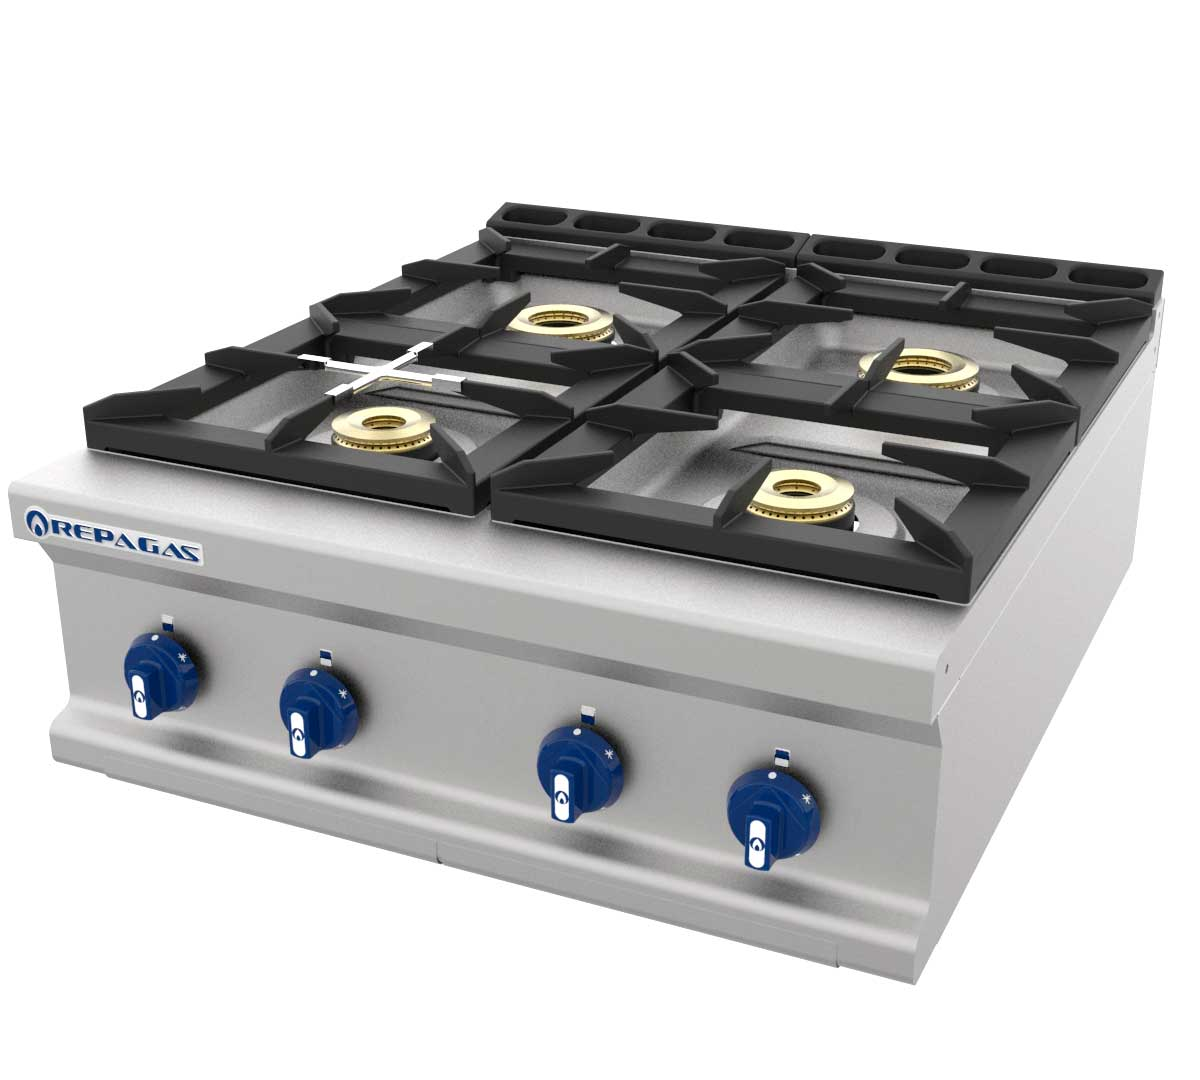 Cocina serie 900 sobremesa gas de repagas - Fogones a gas ...